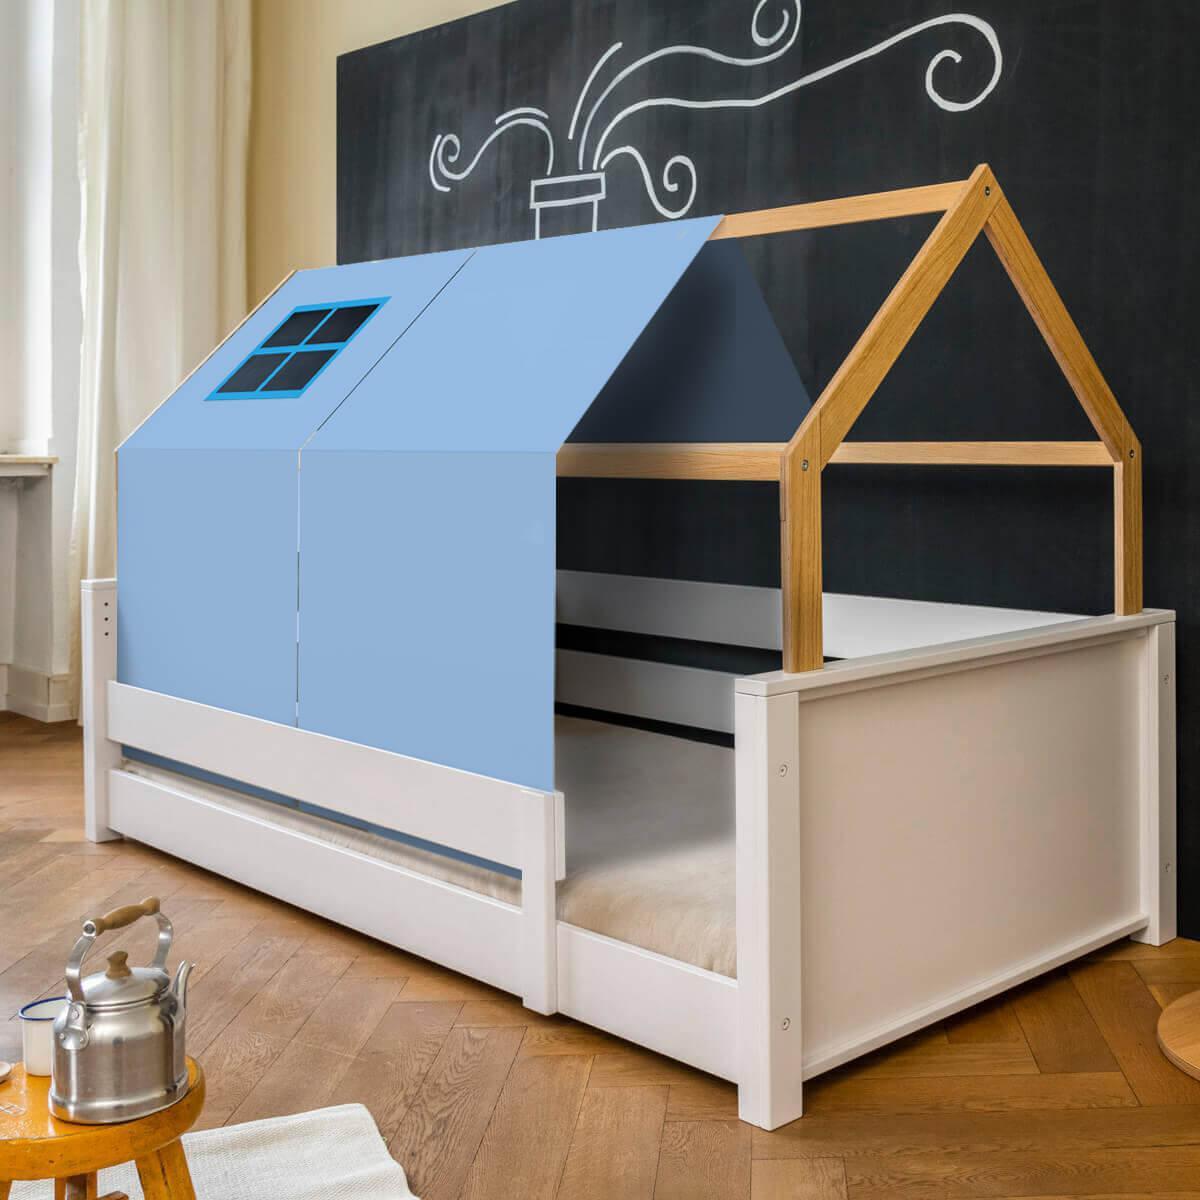 Lit montessori barrière simple cabane KASVA avec textiles Viena green-blue